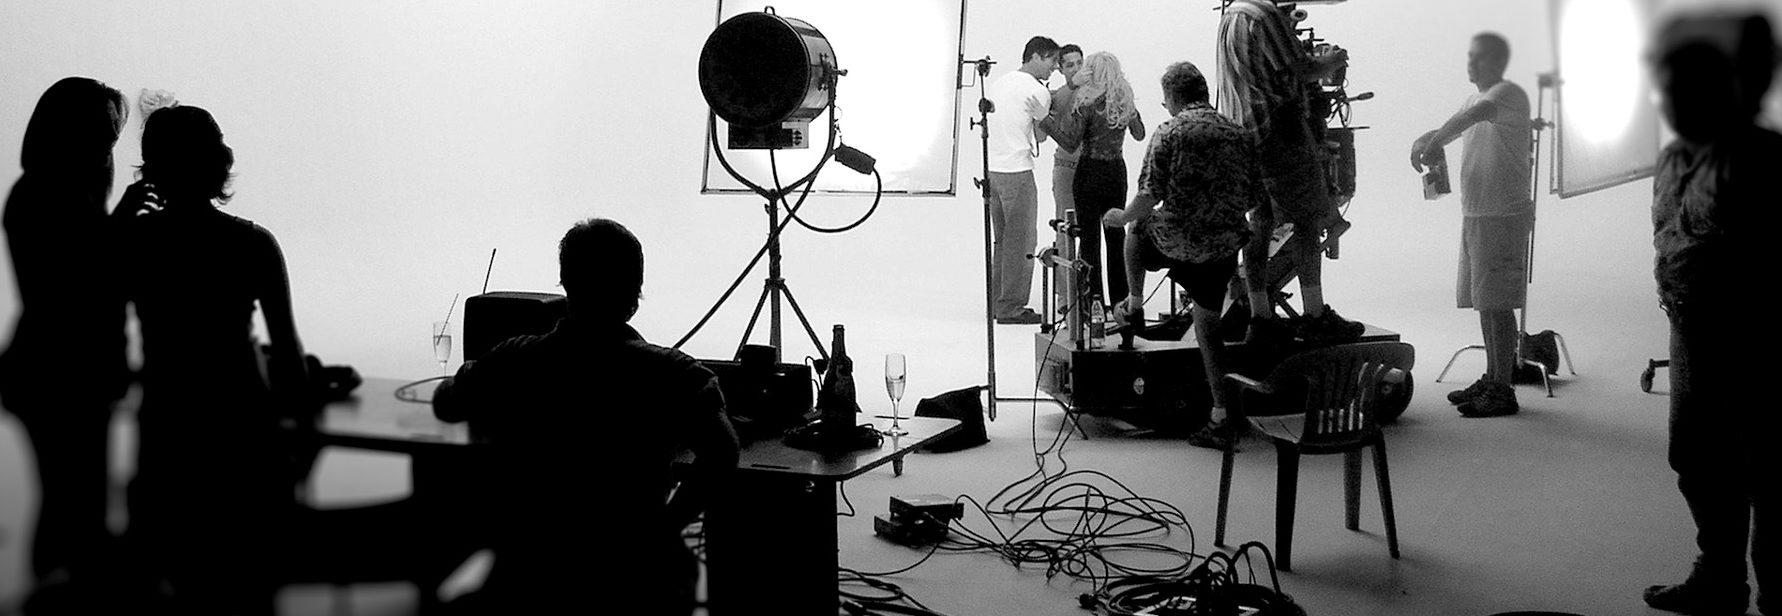 shooting low budget movies - HD1254×768